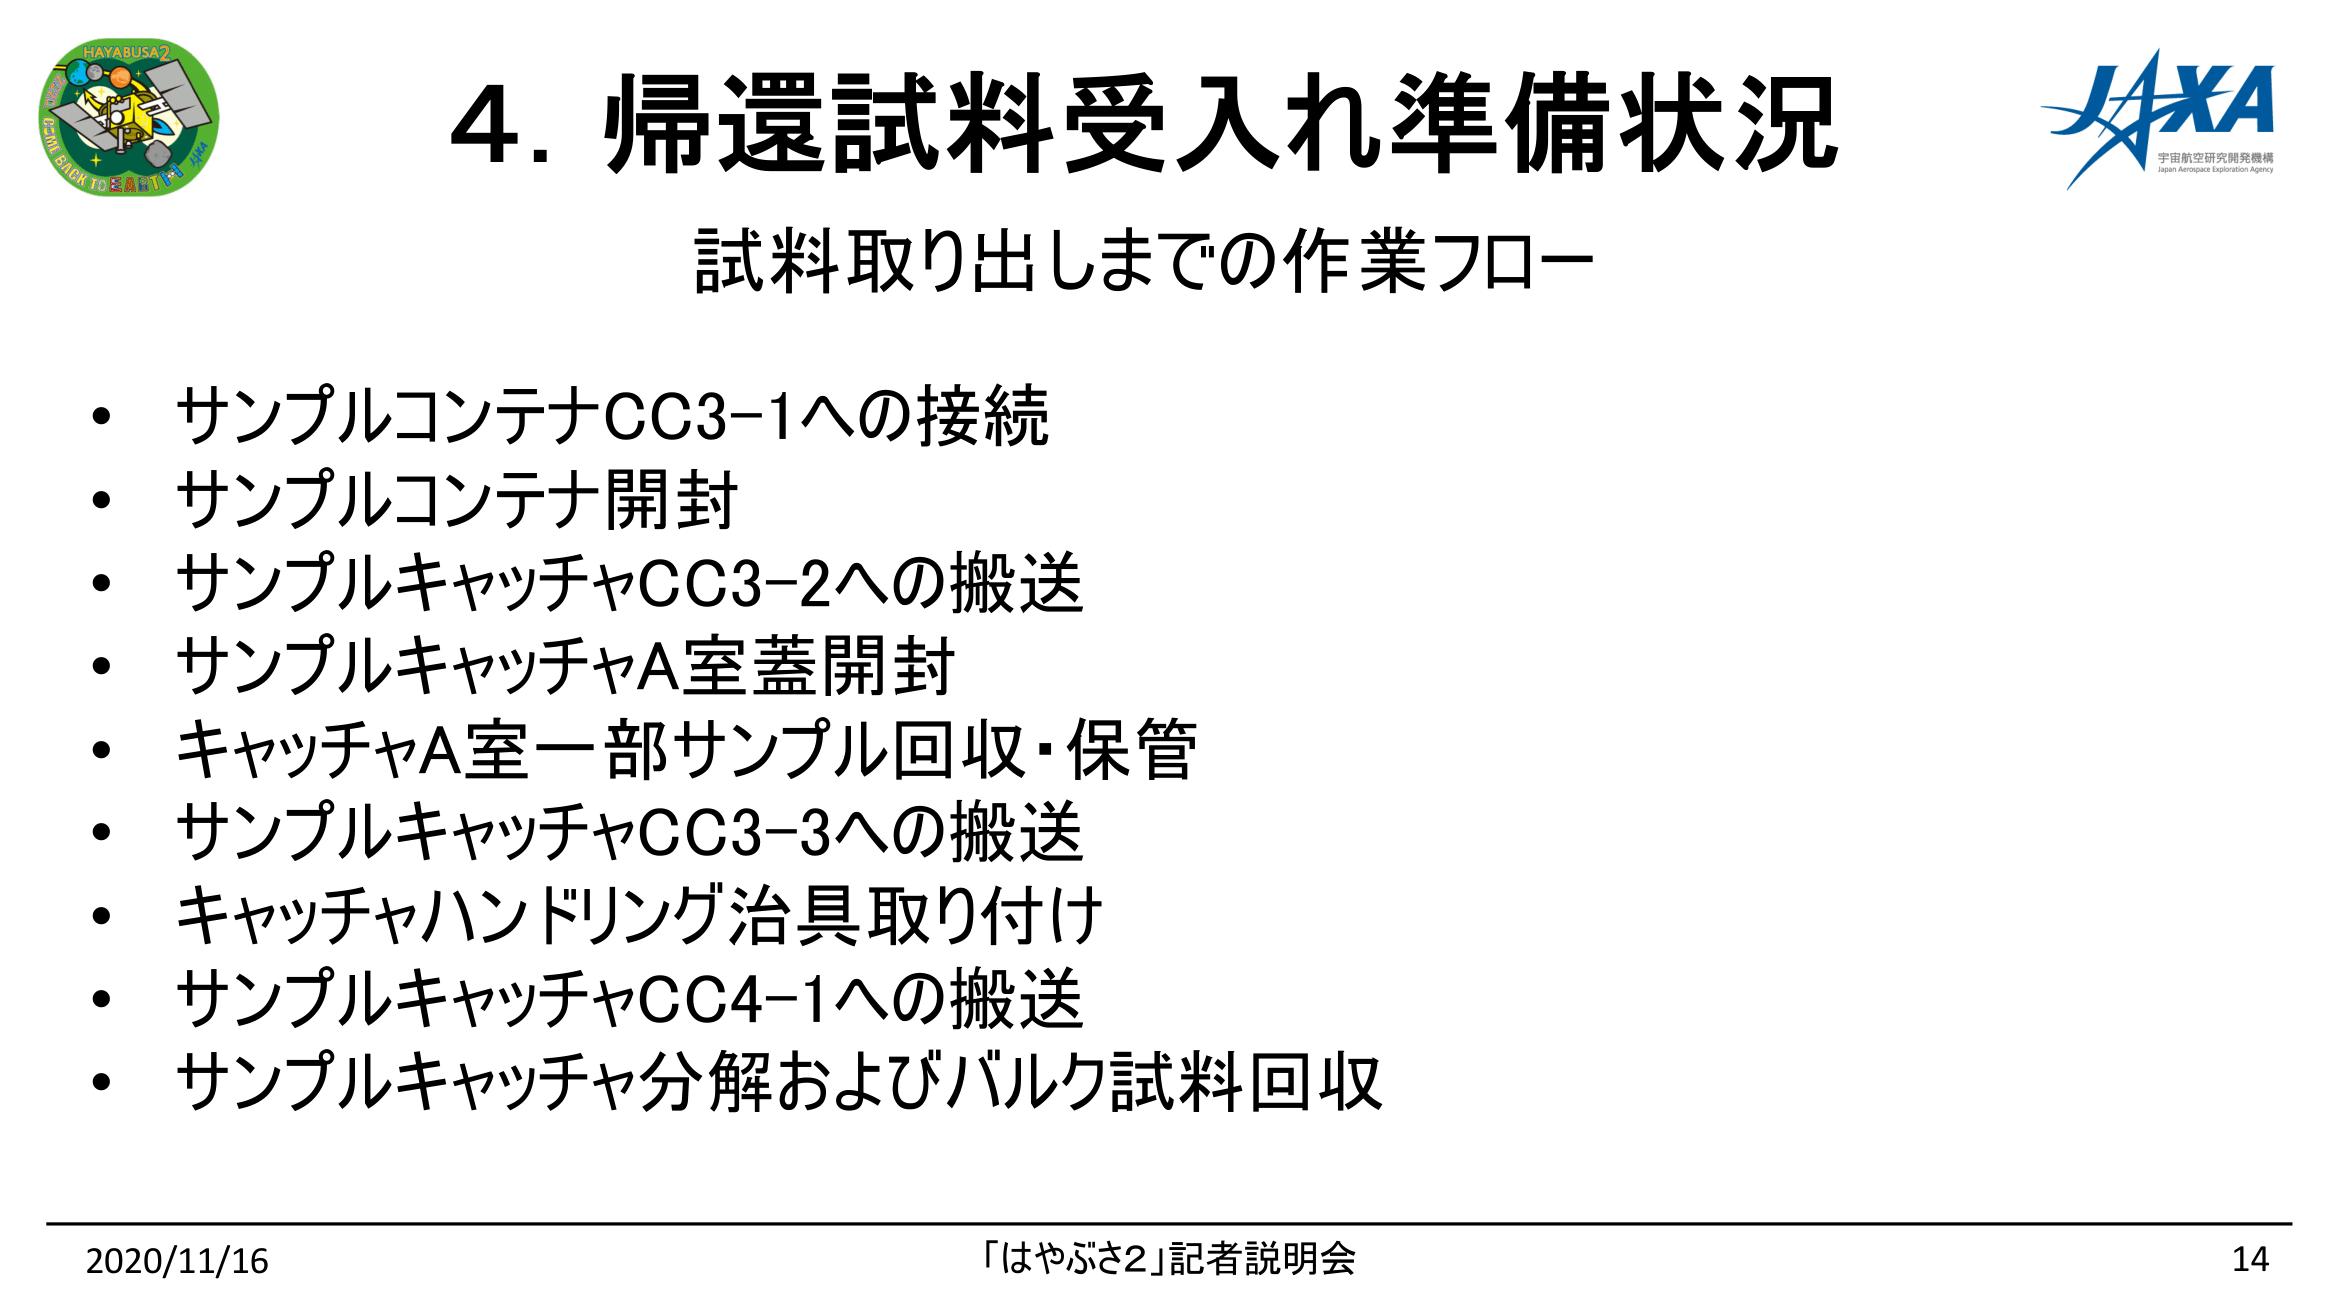 f:id:Imamura:20201116151248p:plain